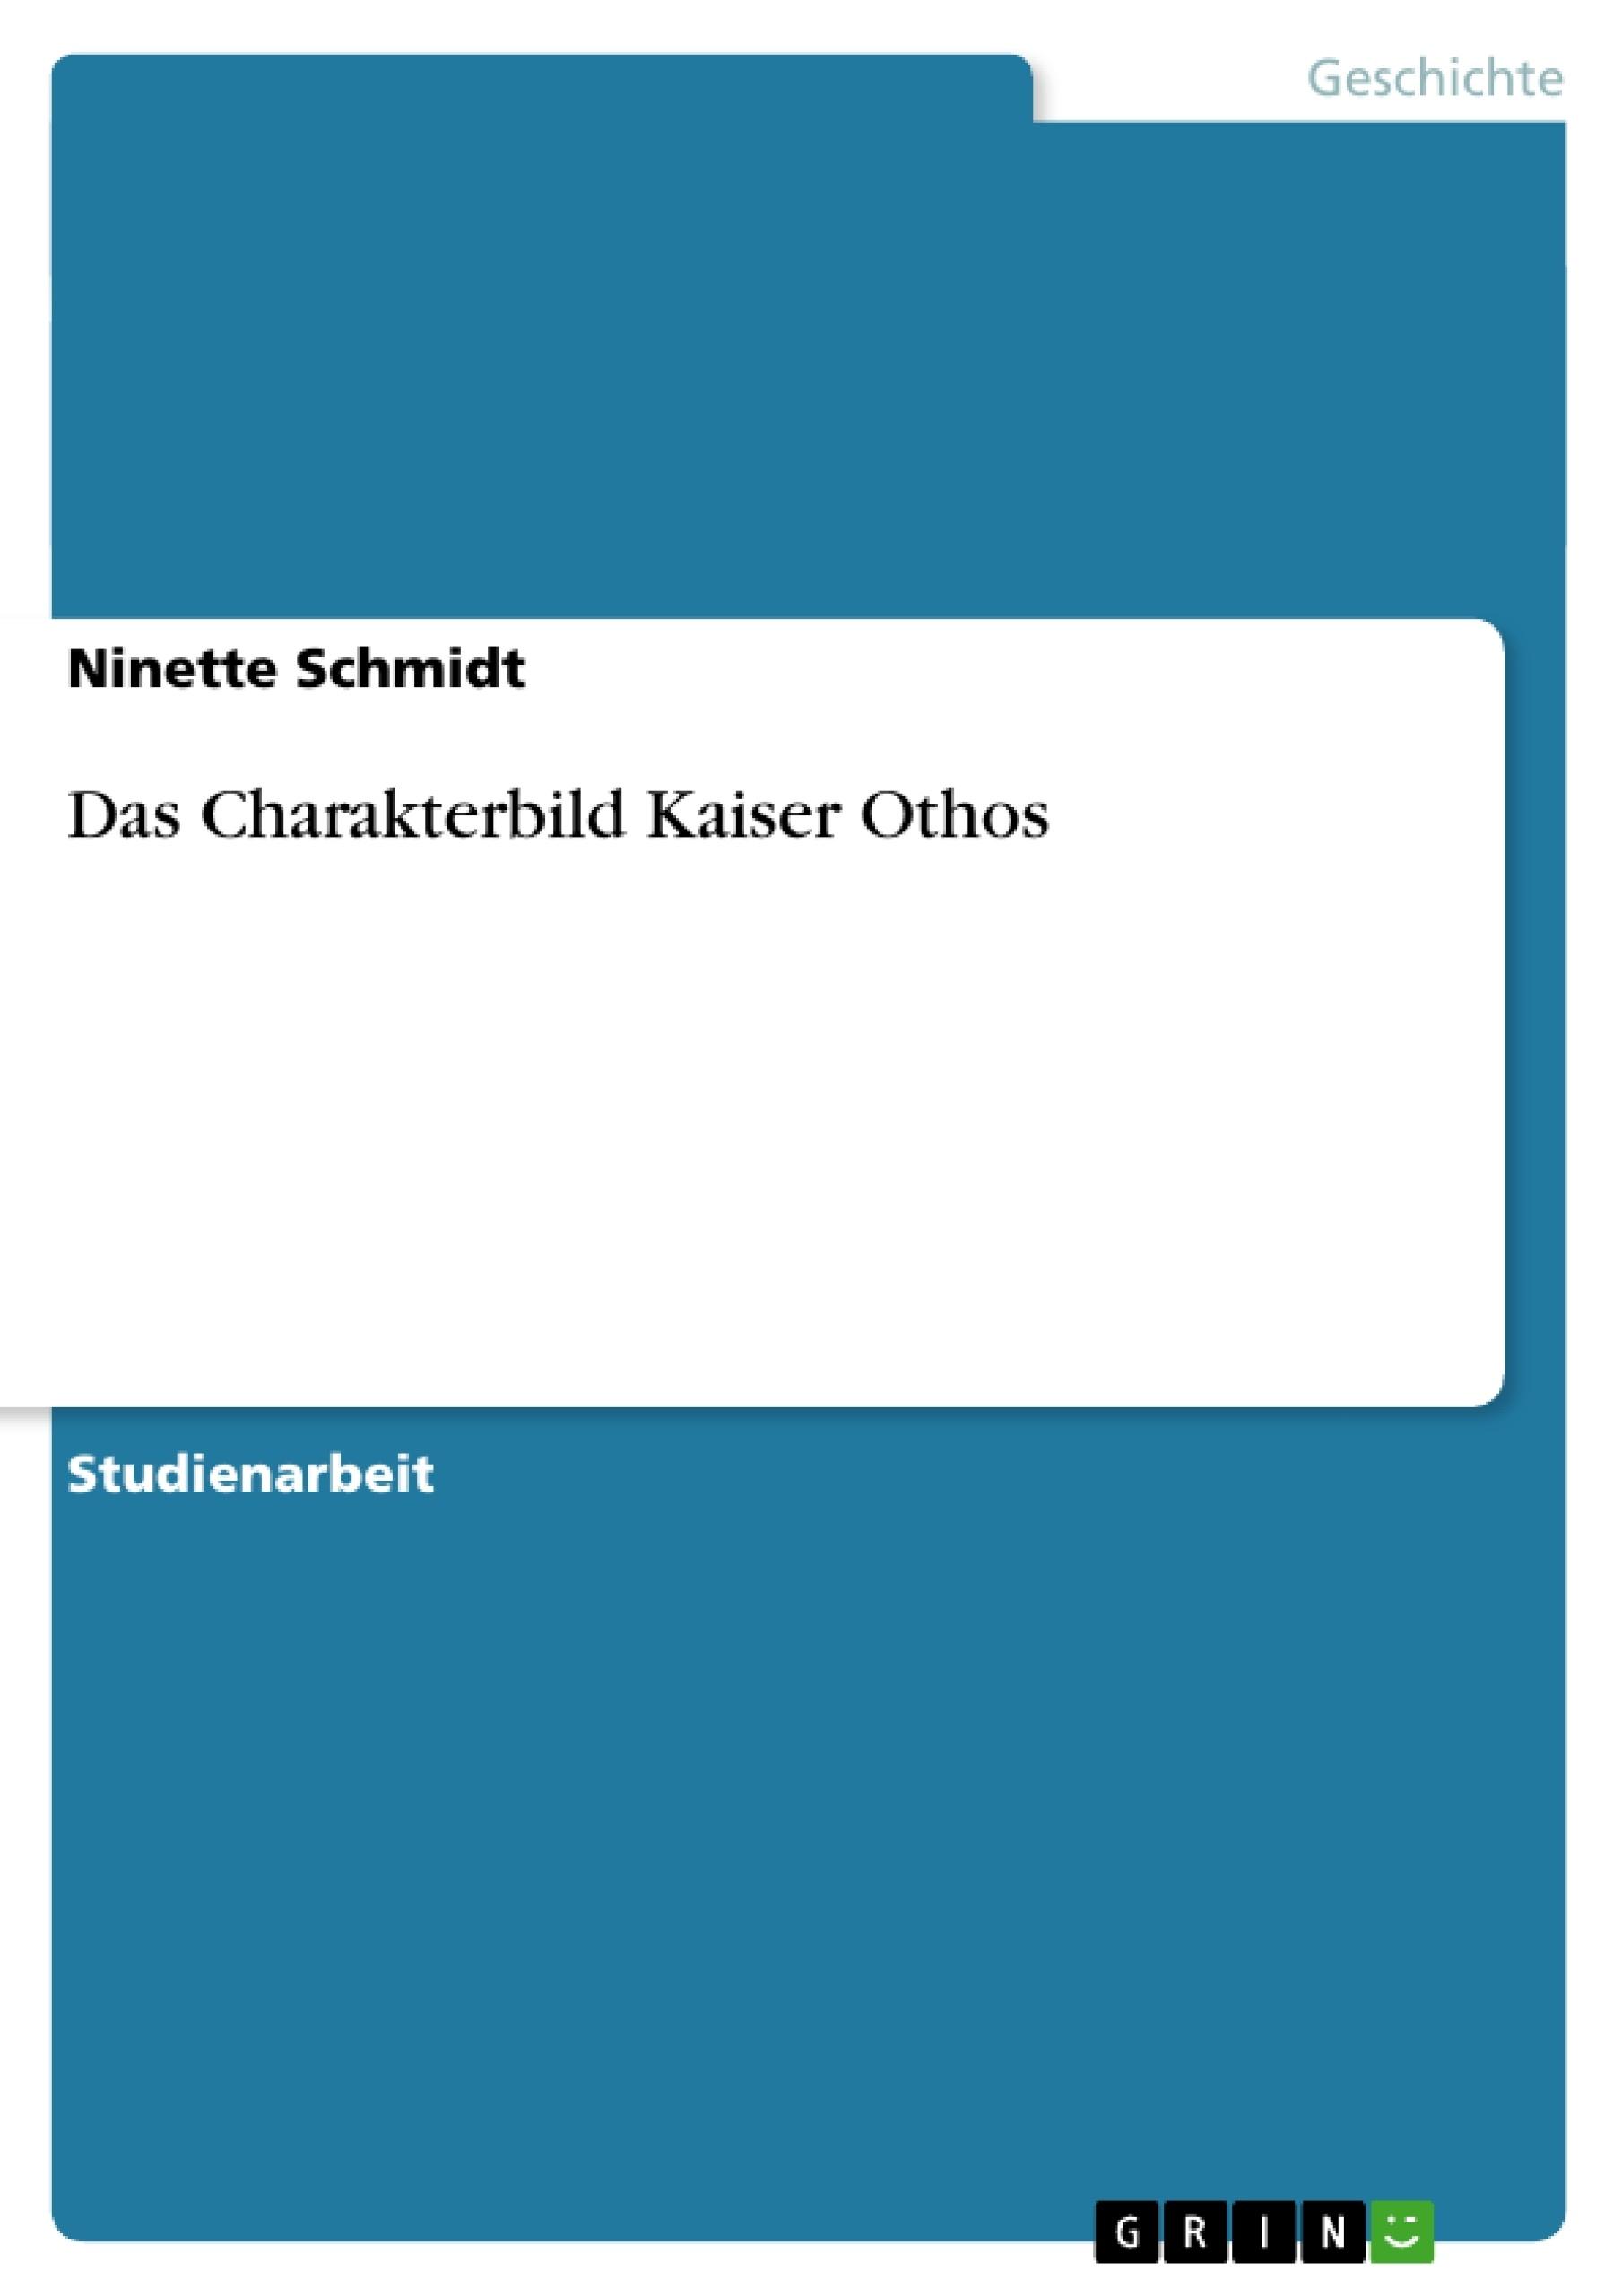 Titel: Das Charakterbild Kaiser Othos